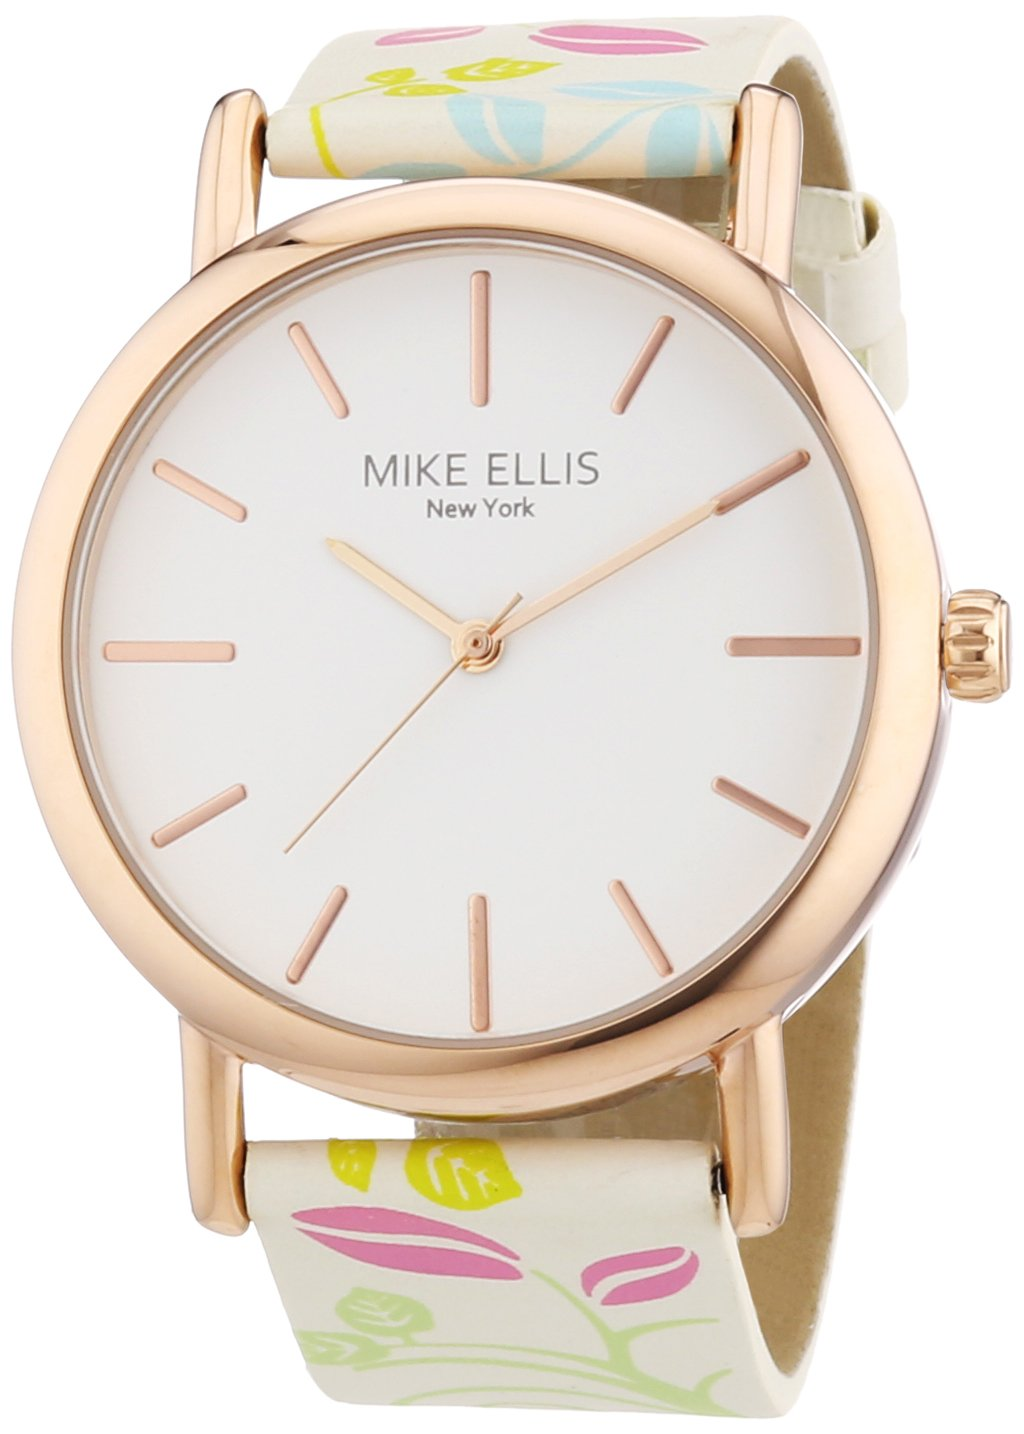 Mike-Ellis-New-York-Damen-Armbanduhr-Analog-Quarz-Kunstleder-L2979